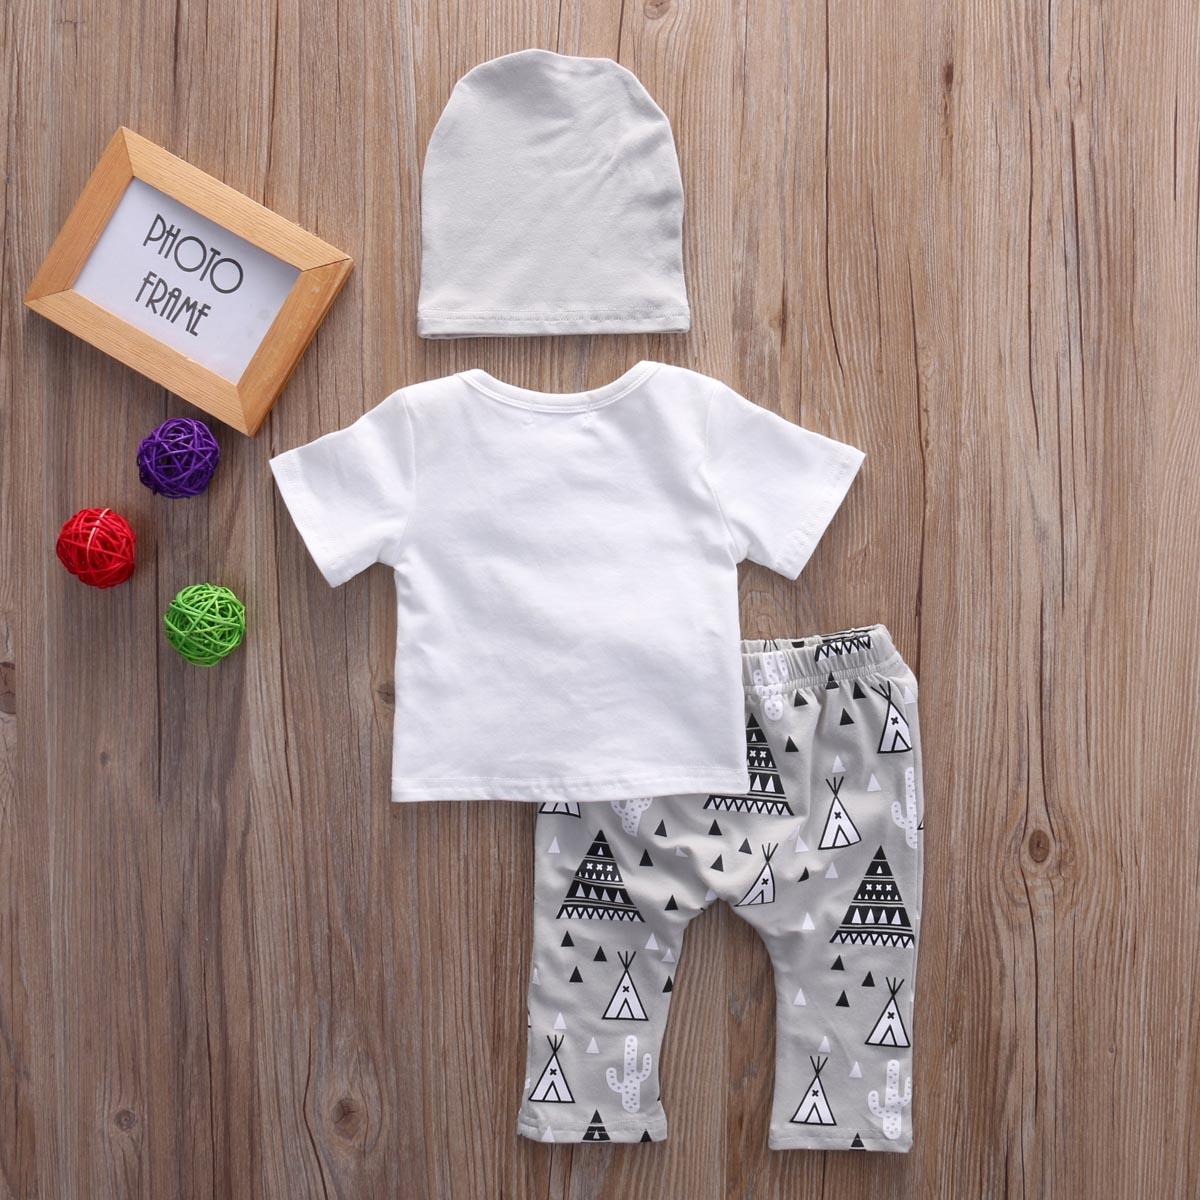 3Pcs-Set-2016-Spring-Autumn-style-Infant-clothes-Clothing-sets-Baby-Girl-Boys-Long-Sleeve-romper-Pantshat-Kids-Clothes-Suit-1